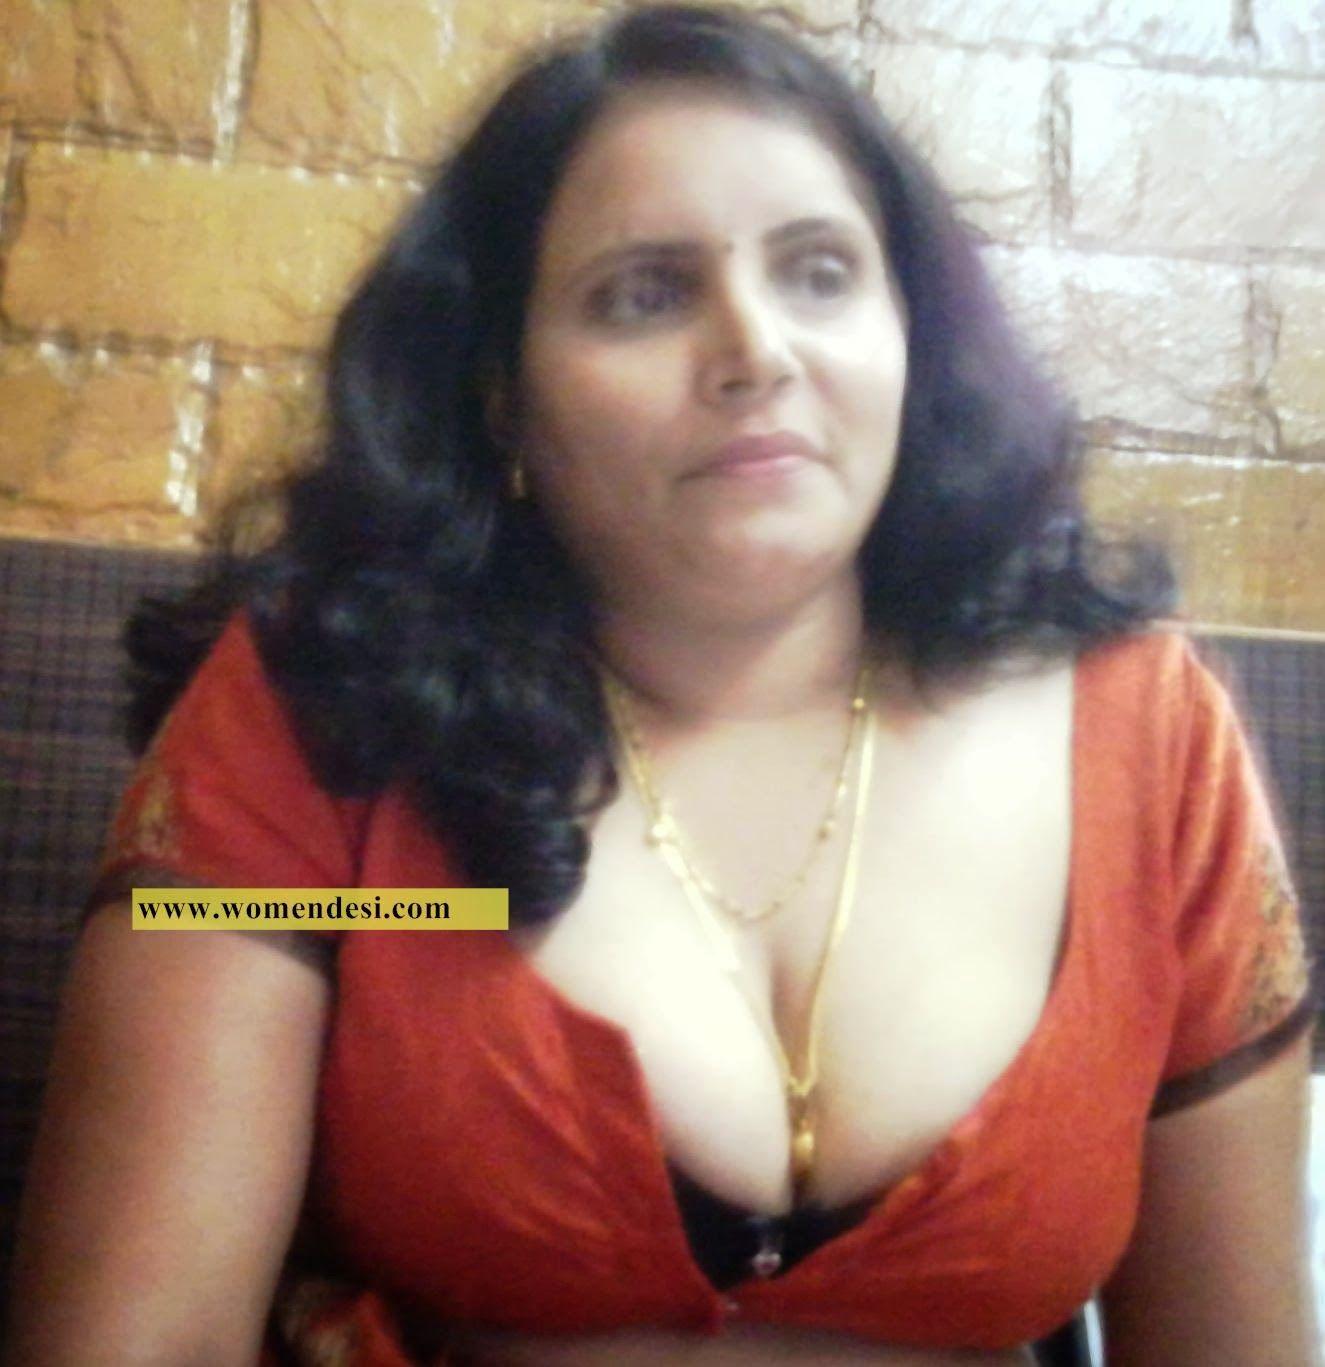 andhra pradesh hot sex videos photos real unseen women girls andhra